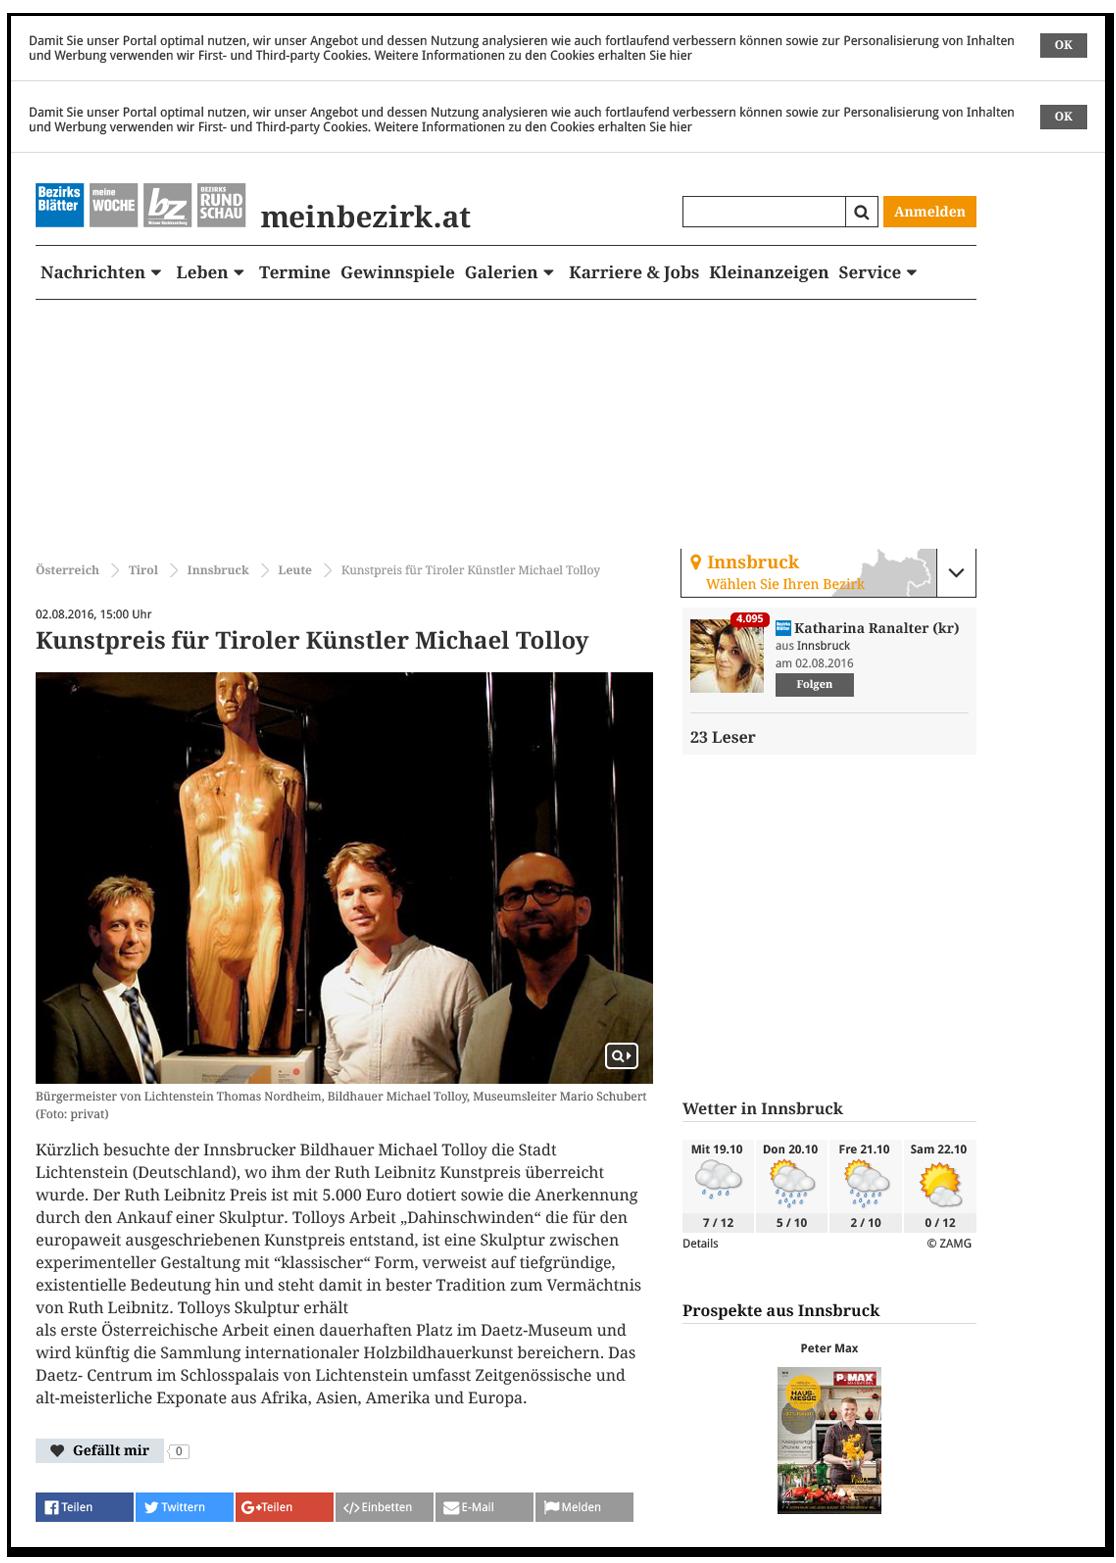 2016-Ruth-Leibnitz-Kunstpreis-Daetzmuseum-1